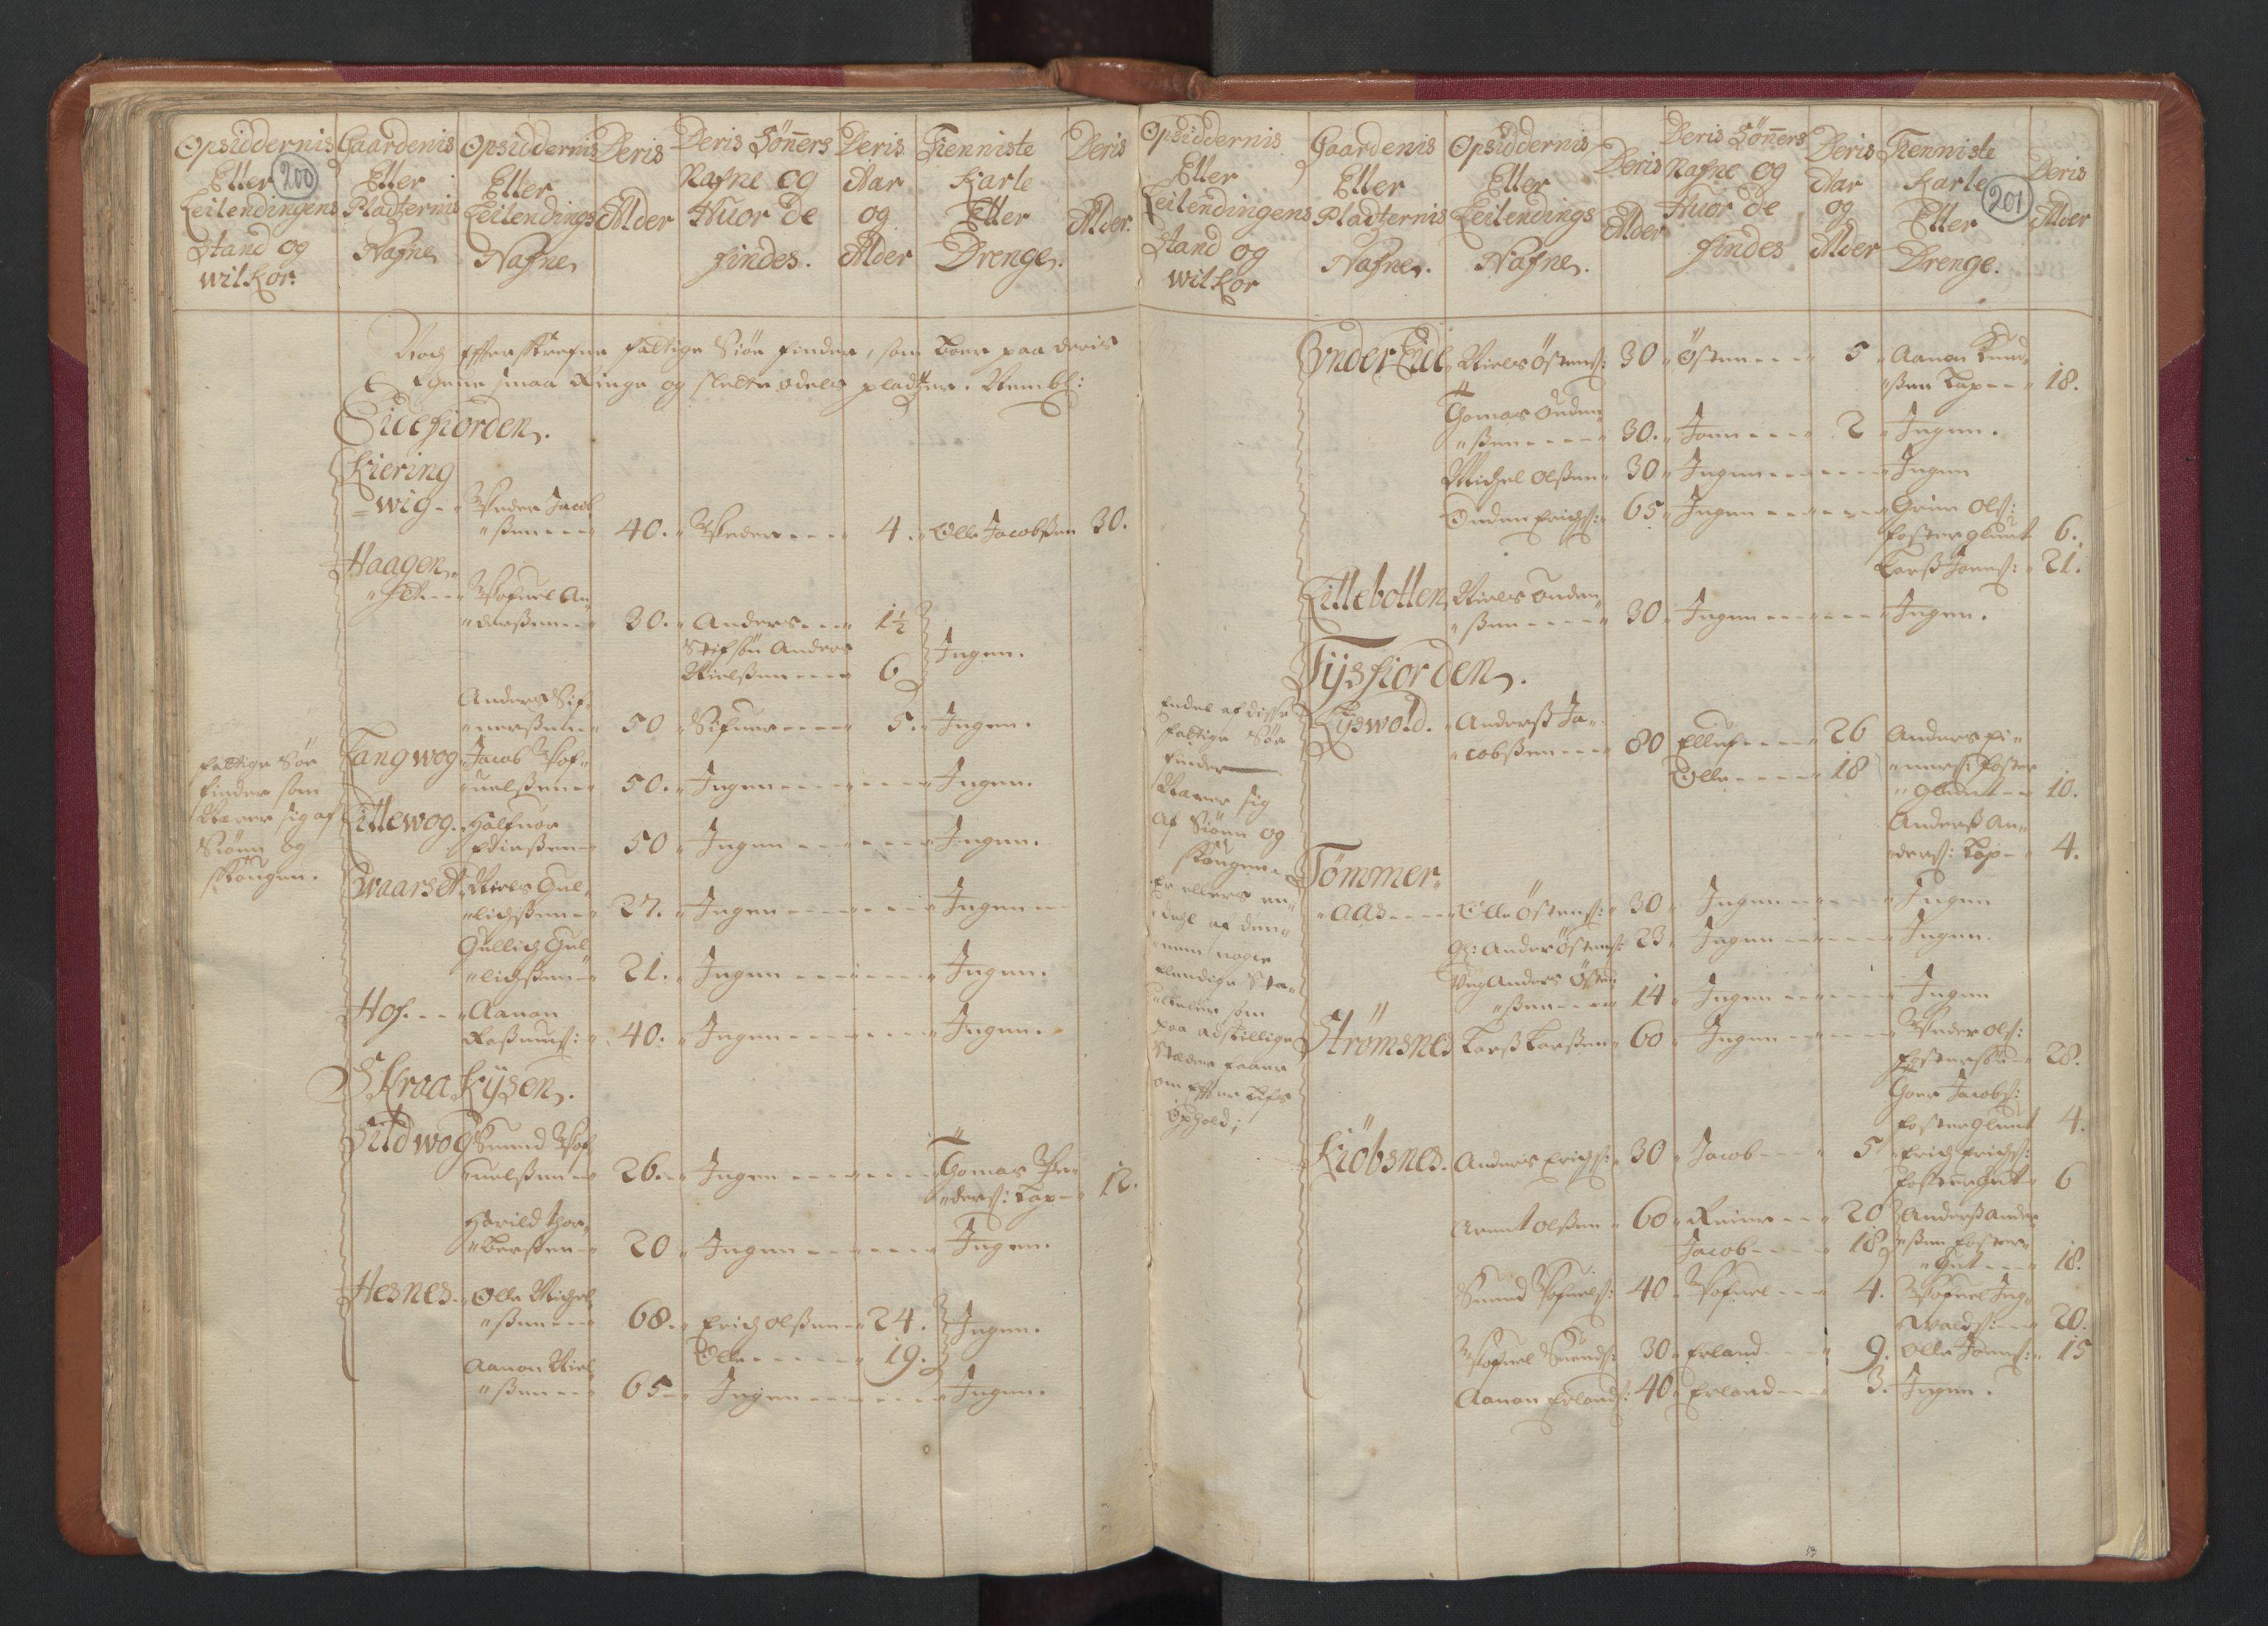 RA, Manntallet 1701, nr. 17: Salten fogderi, 1701, s. 200-201